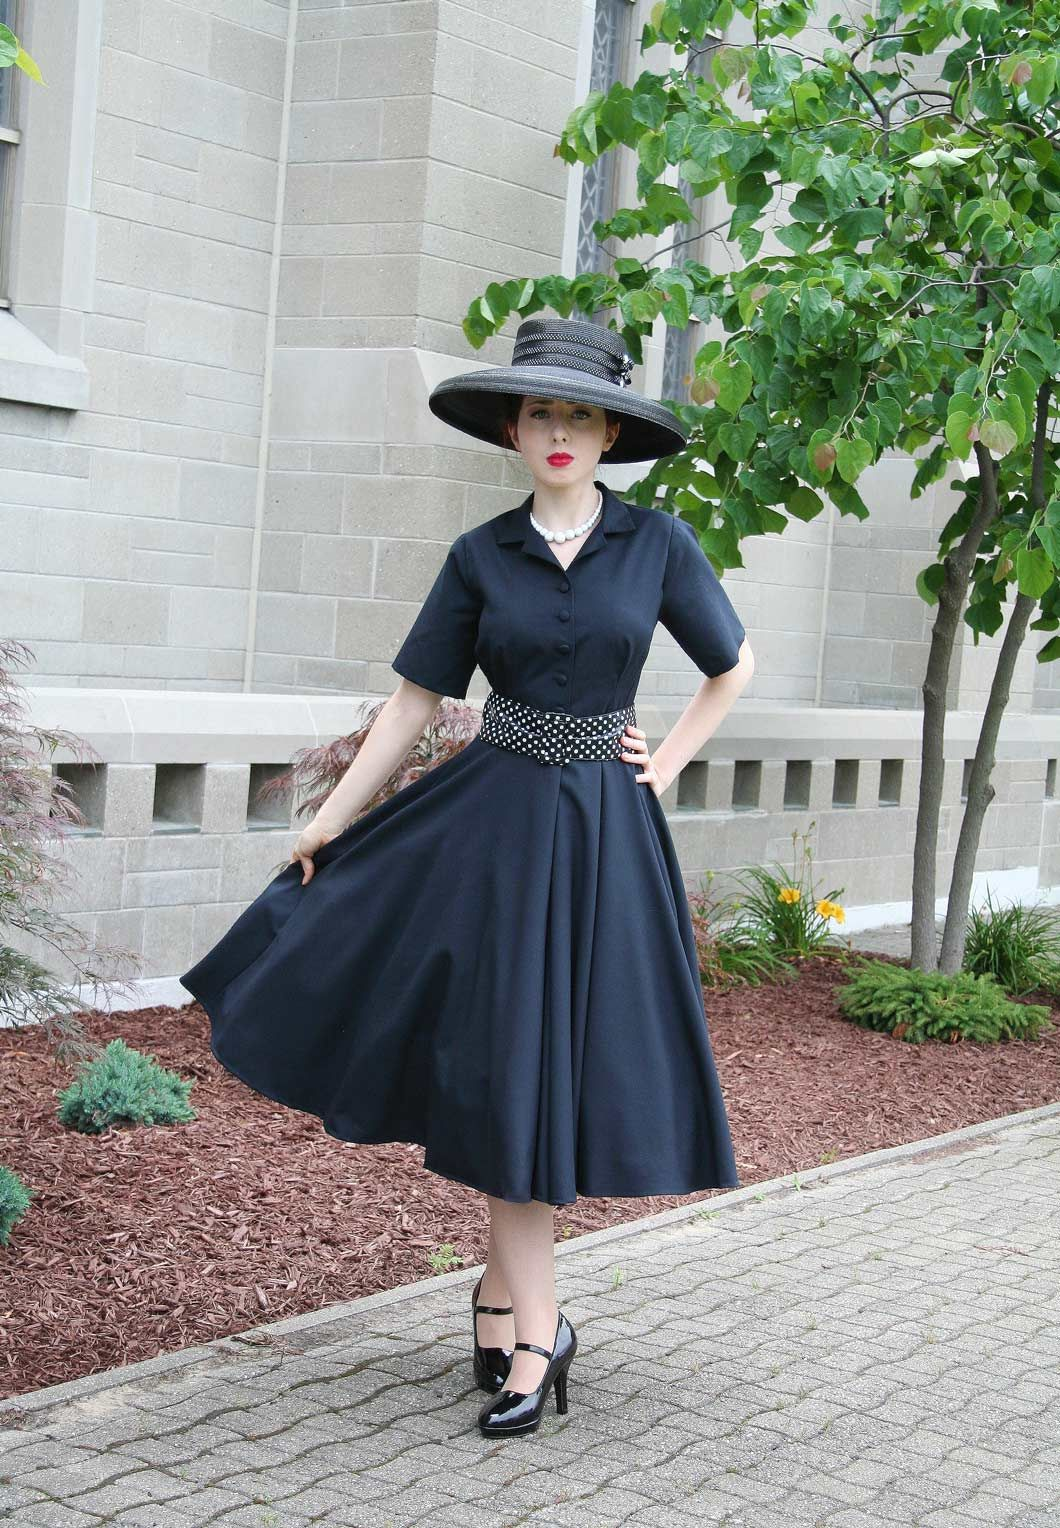 Claudette Retro Black Dress Retro Black Dress 1950s Inspired Dress Classy Work Outfits [ 1528 x 1060 Pixel ]